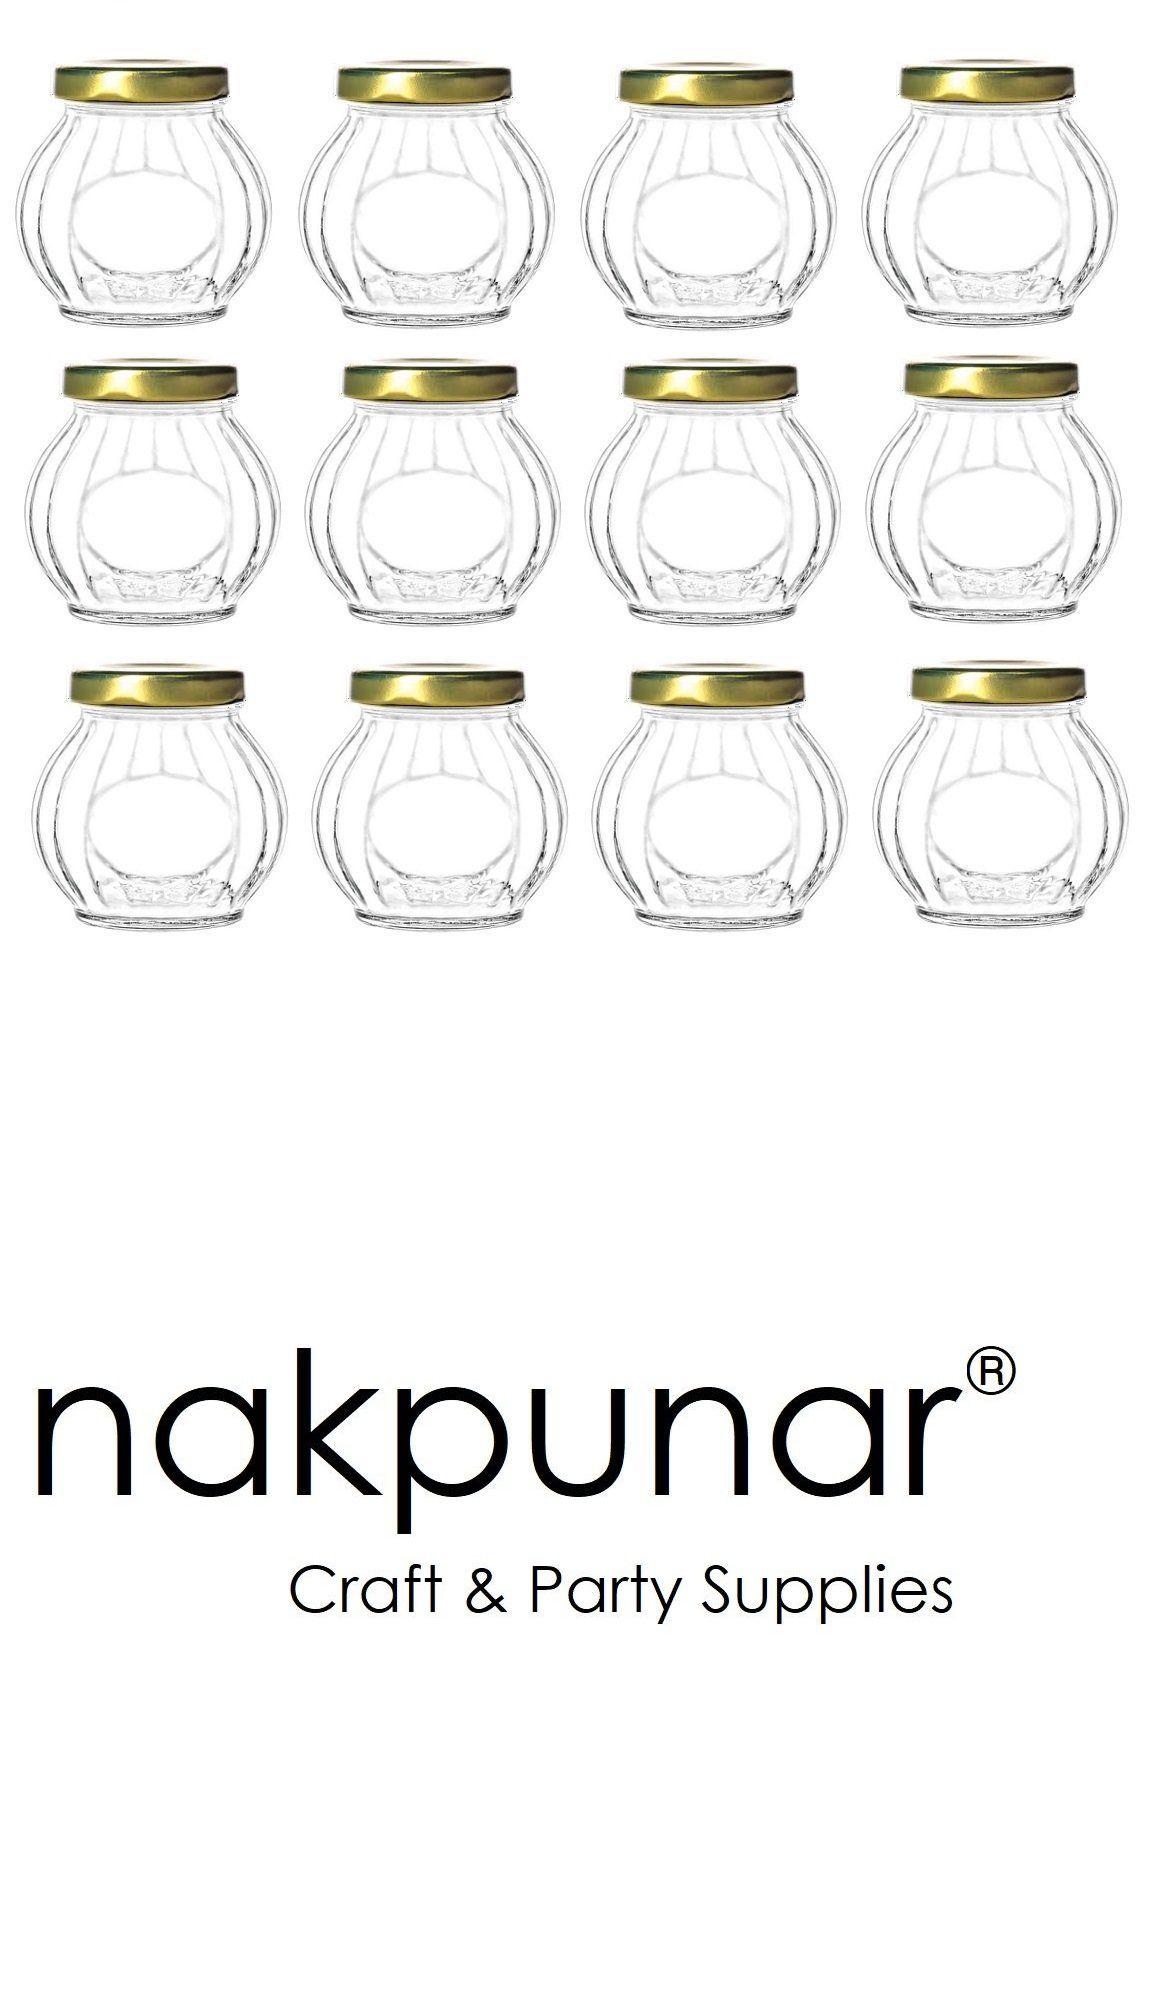 038ef77cce61 Canisters and Jars 20654: Nakpunar 12 Pcs 10 Oz Round Glass Jars ...